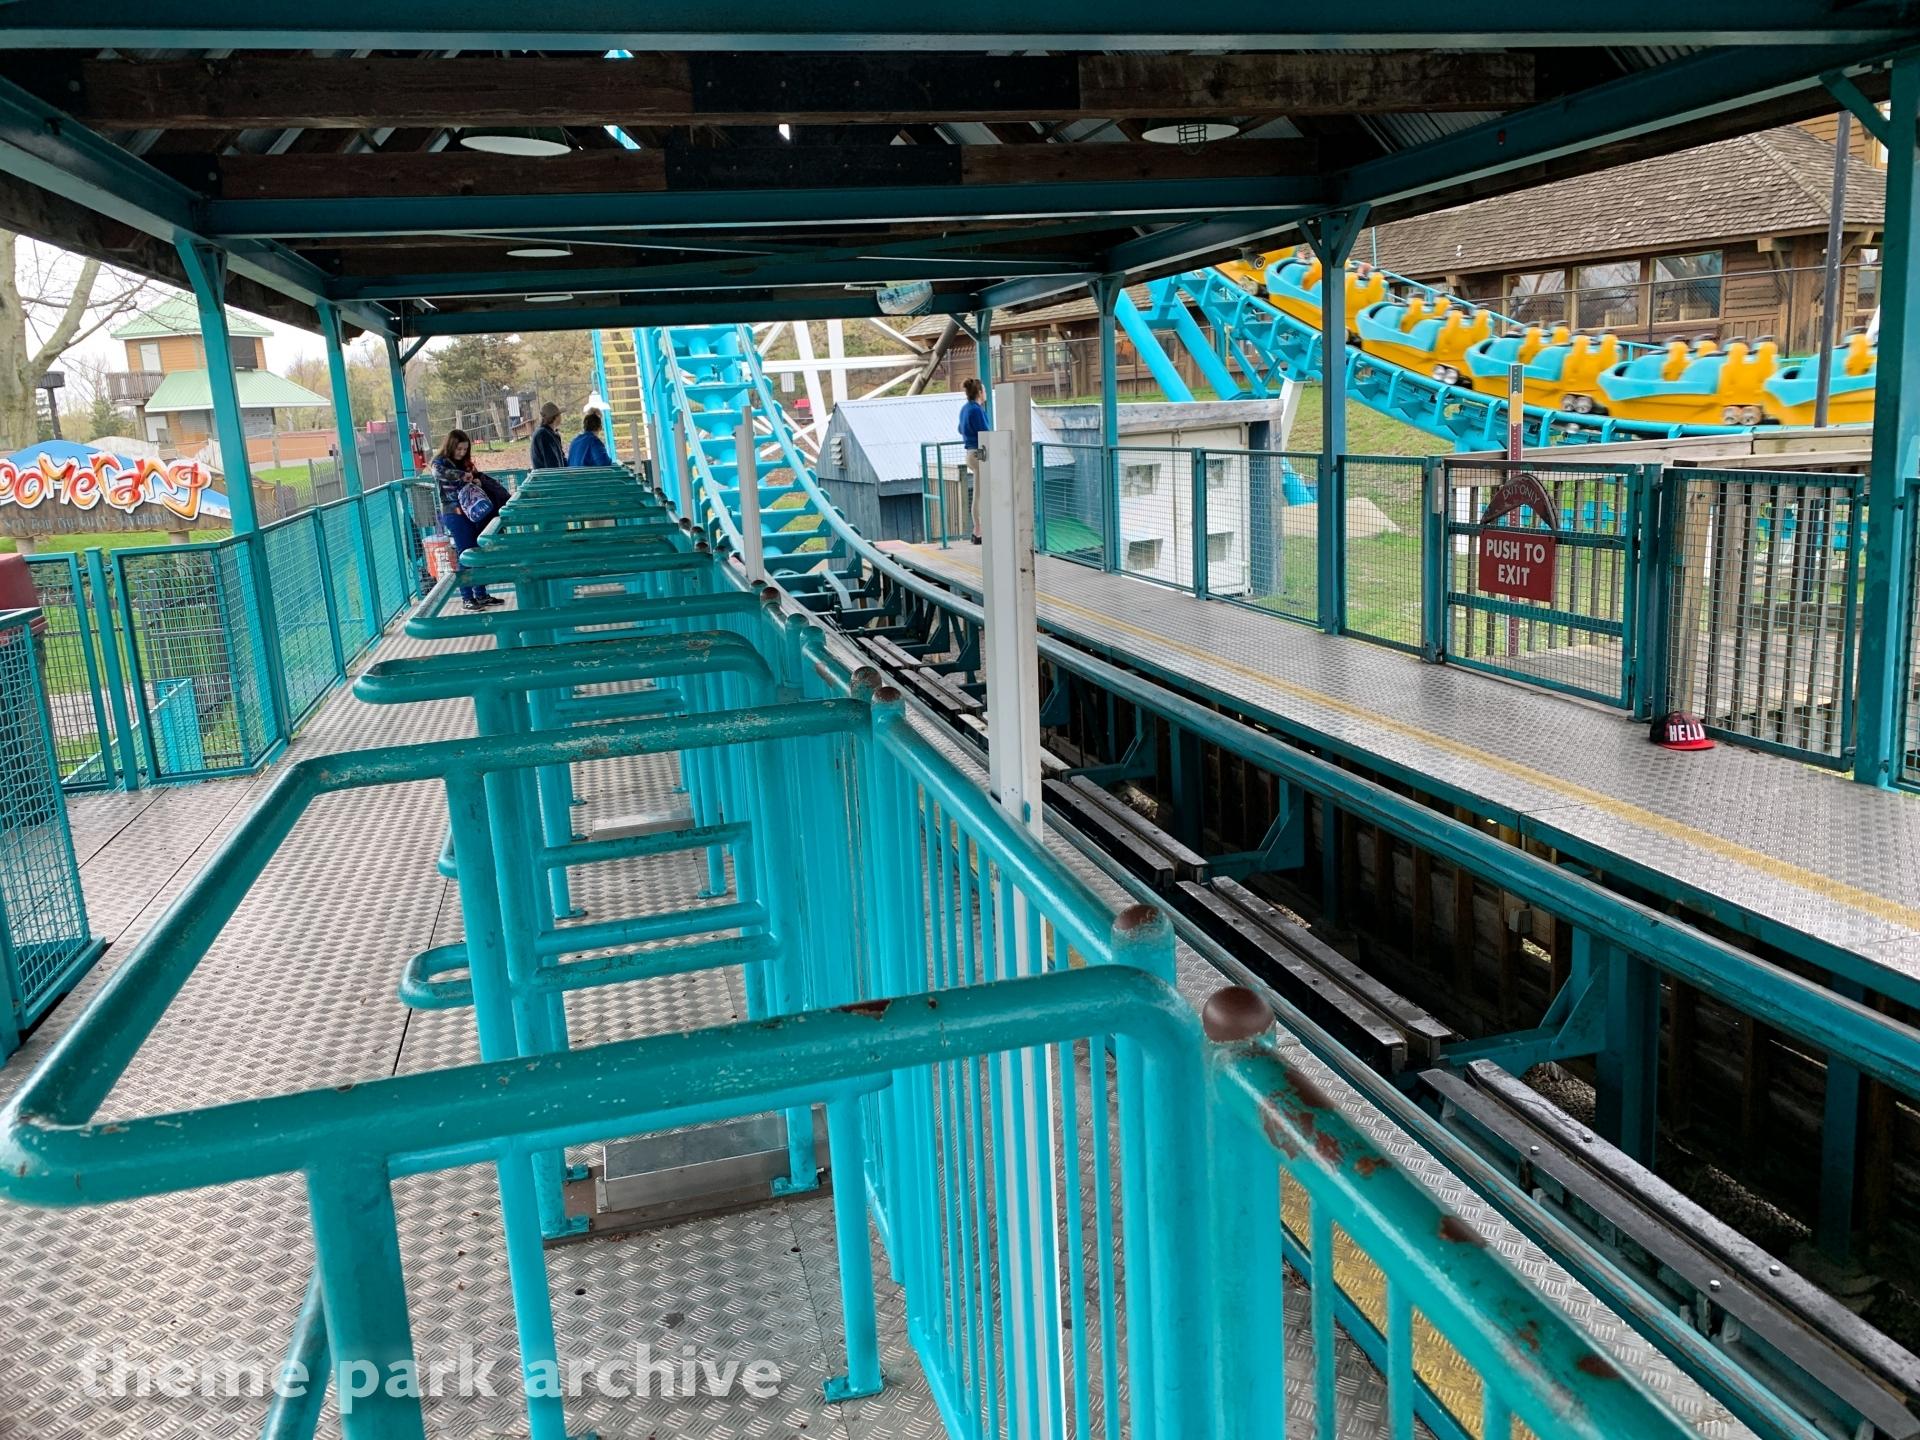 Boomerang at Six Flags Darien Lake